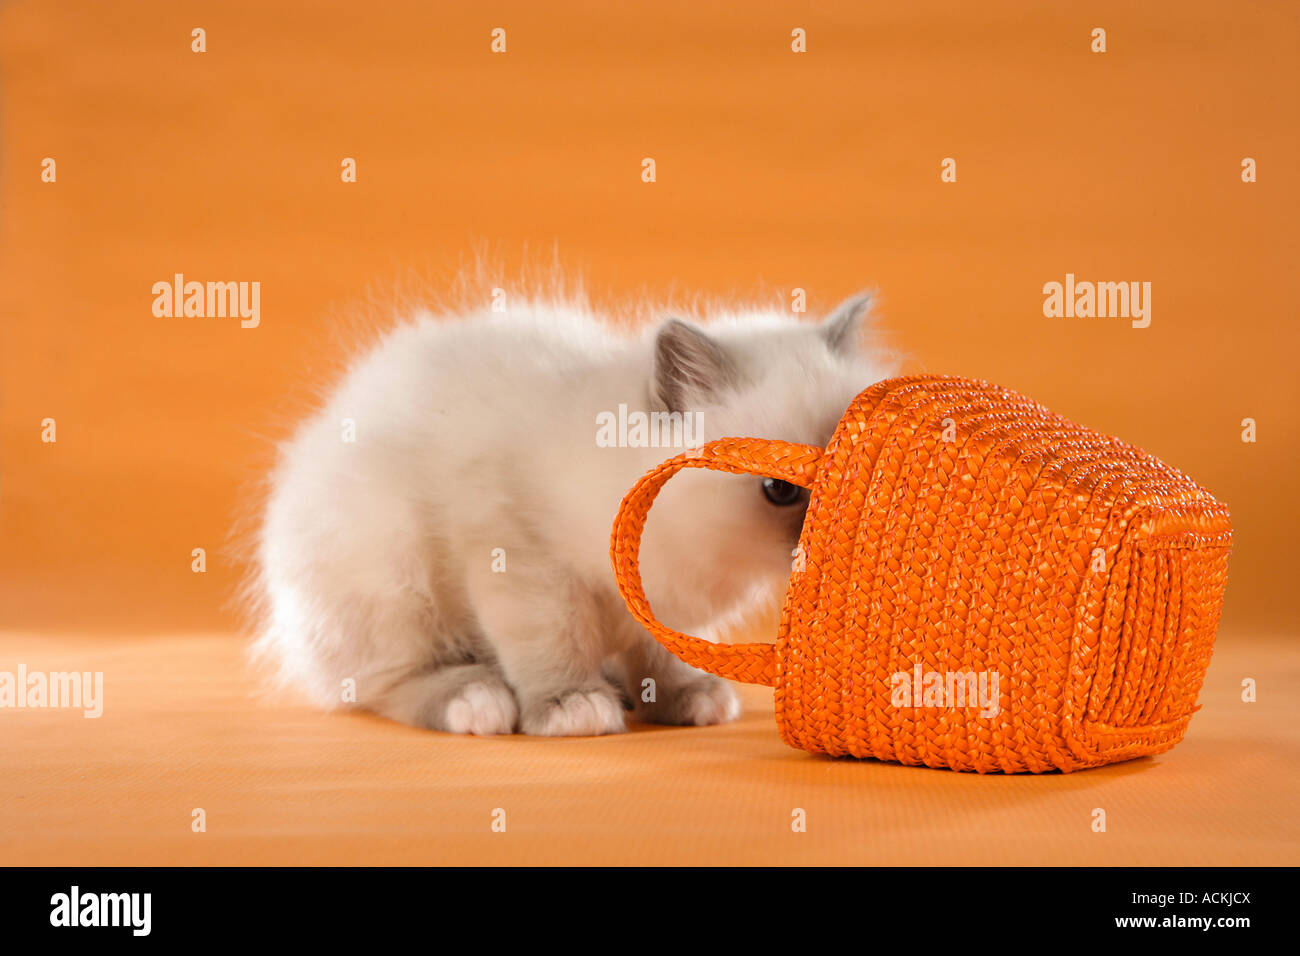 Sacred cat of Burma - kitten looking in a basket - Stock Image